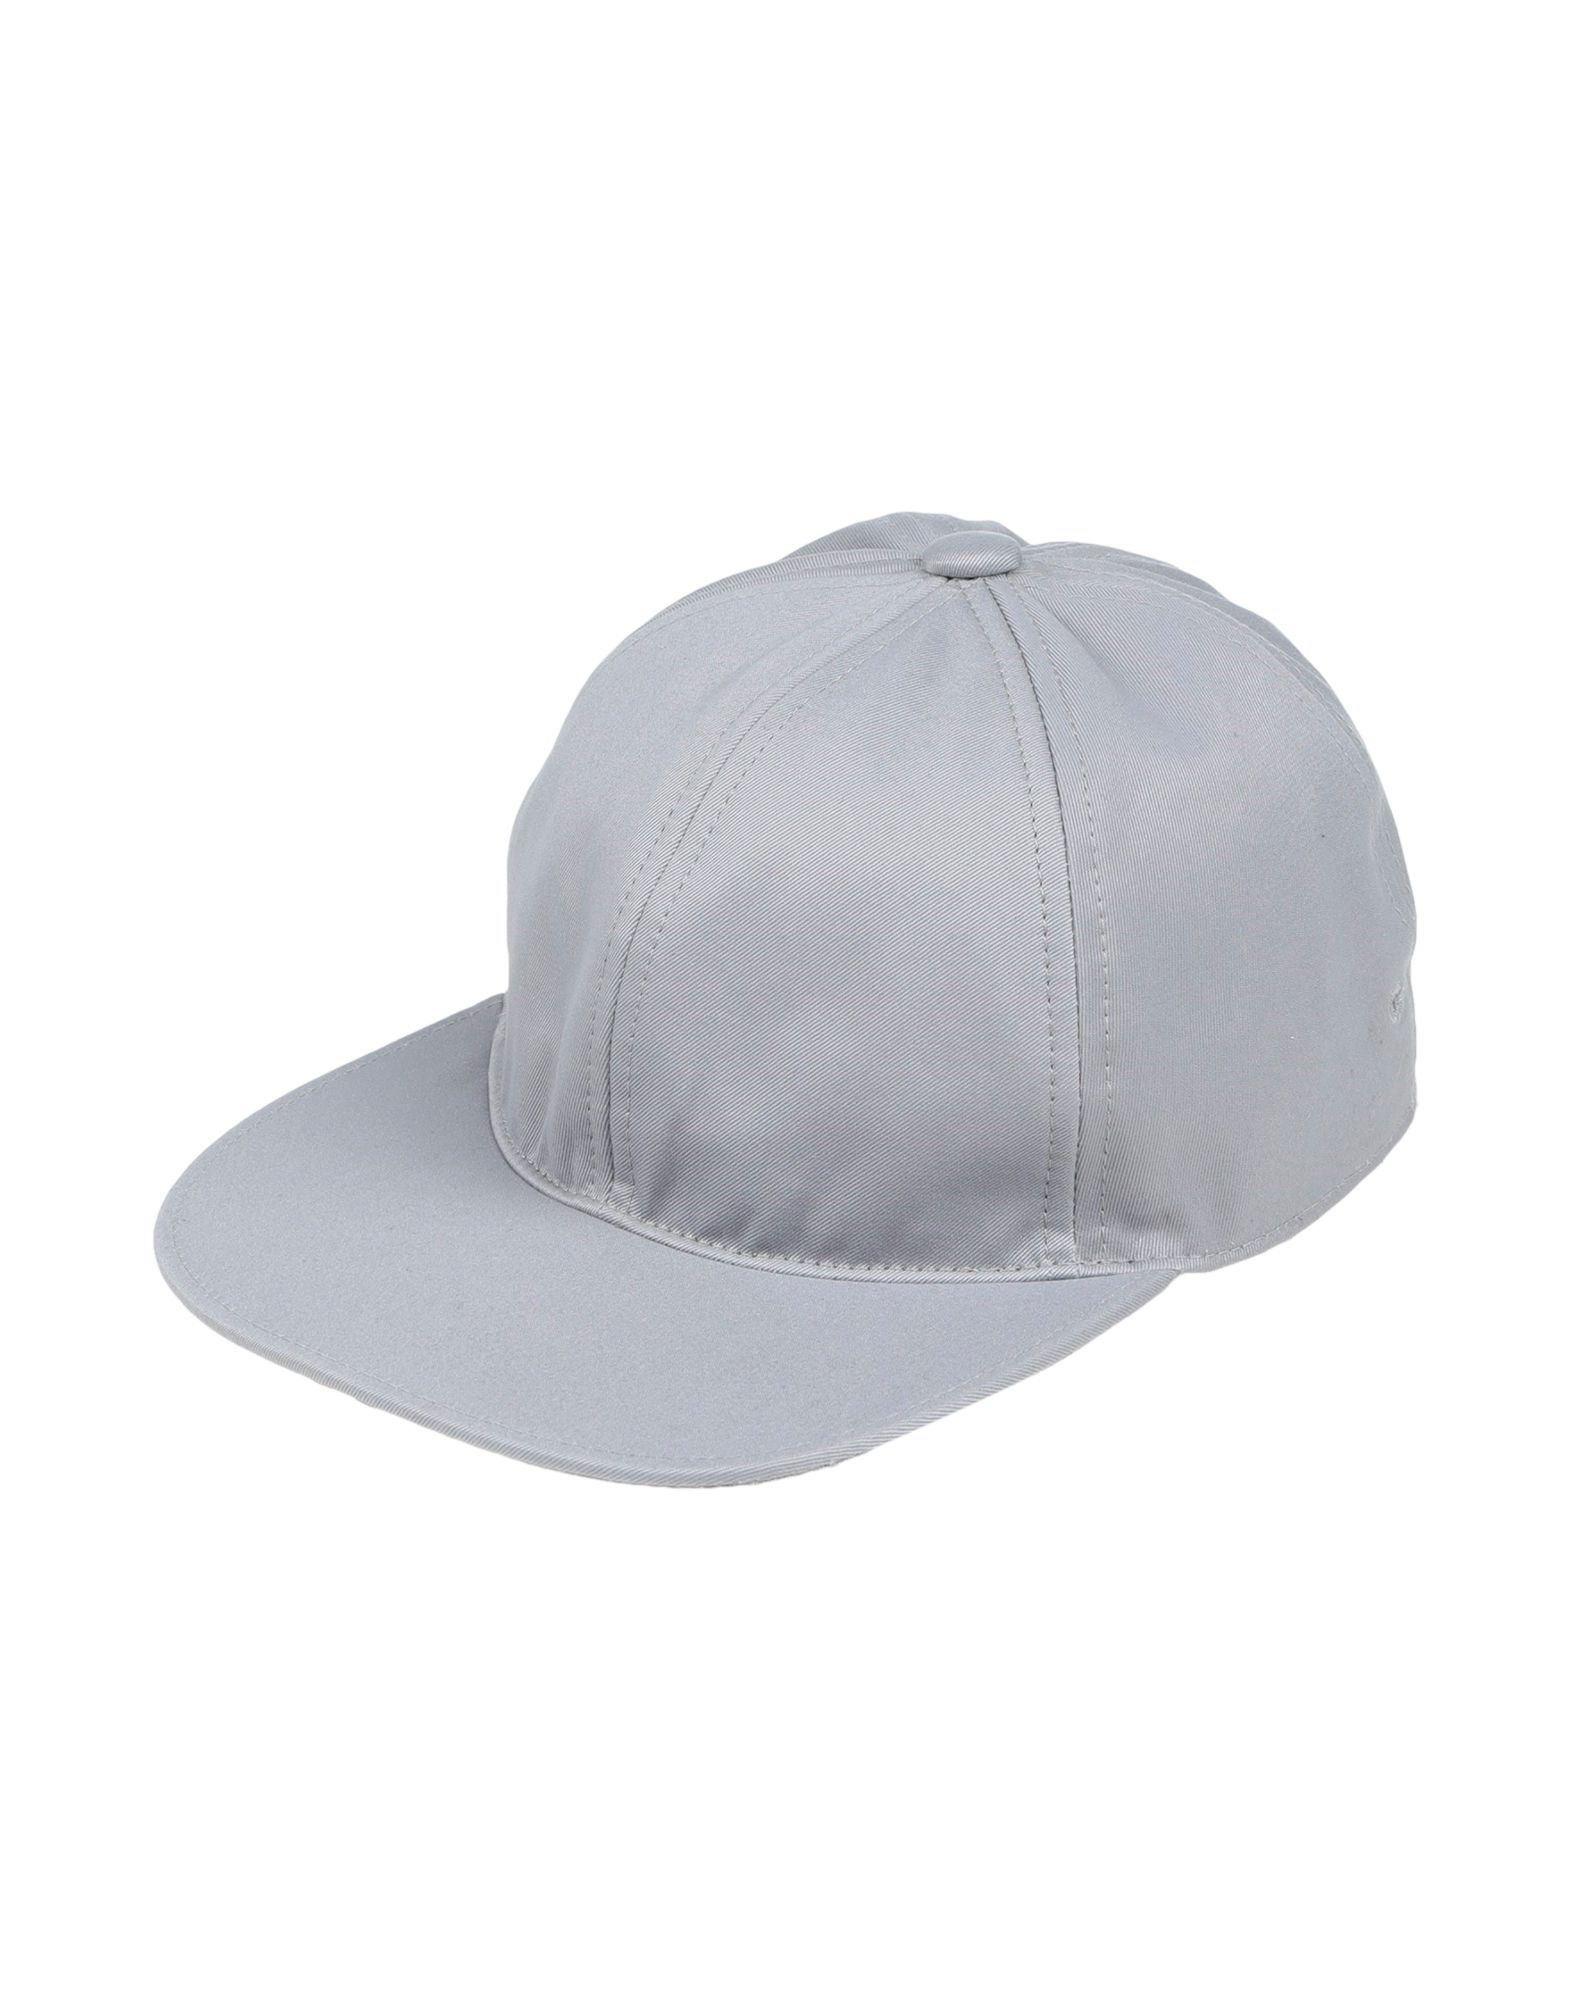 3f70c05ed5c91 Thom Browne Hats In Grey